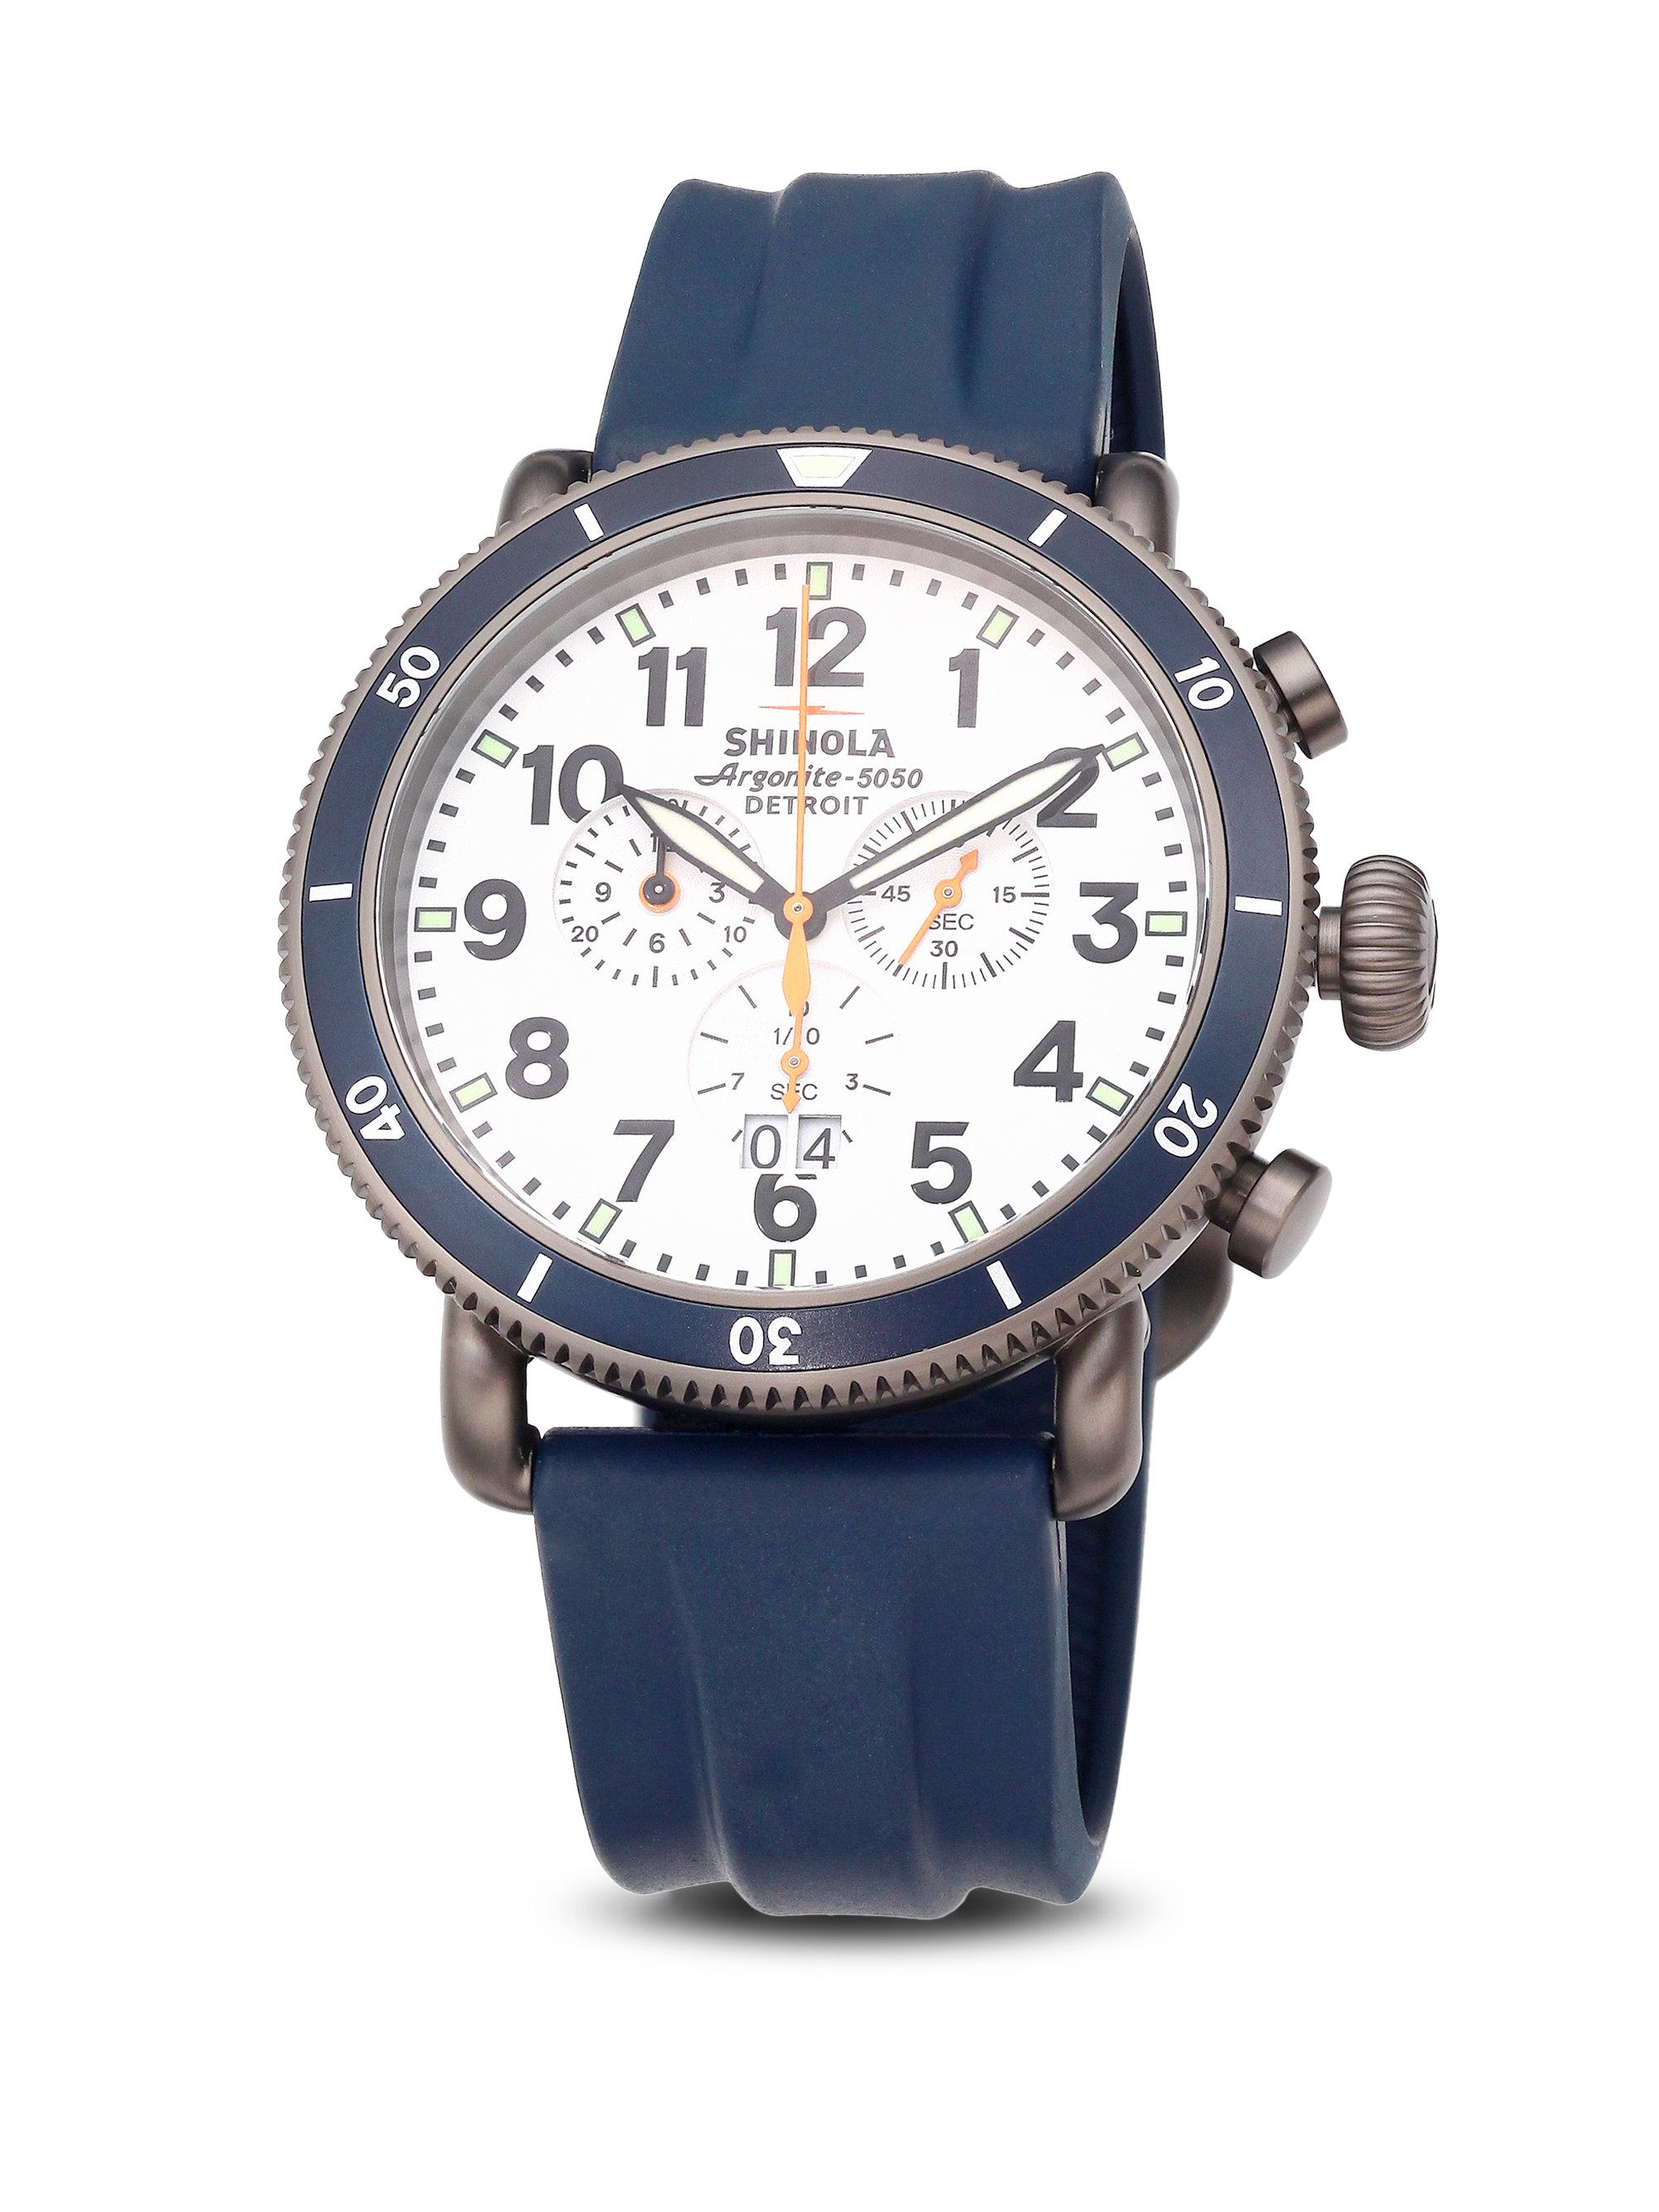 67fe6f683 Shinola Runwell Sport Stainless Steel Chronograph Strap Watch in ...